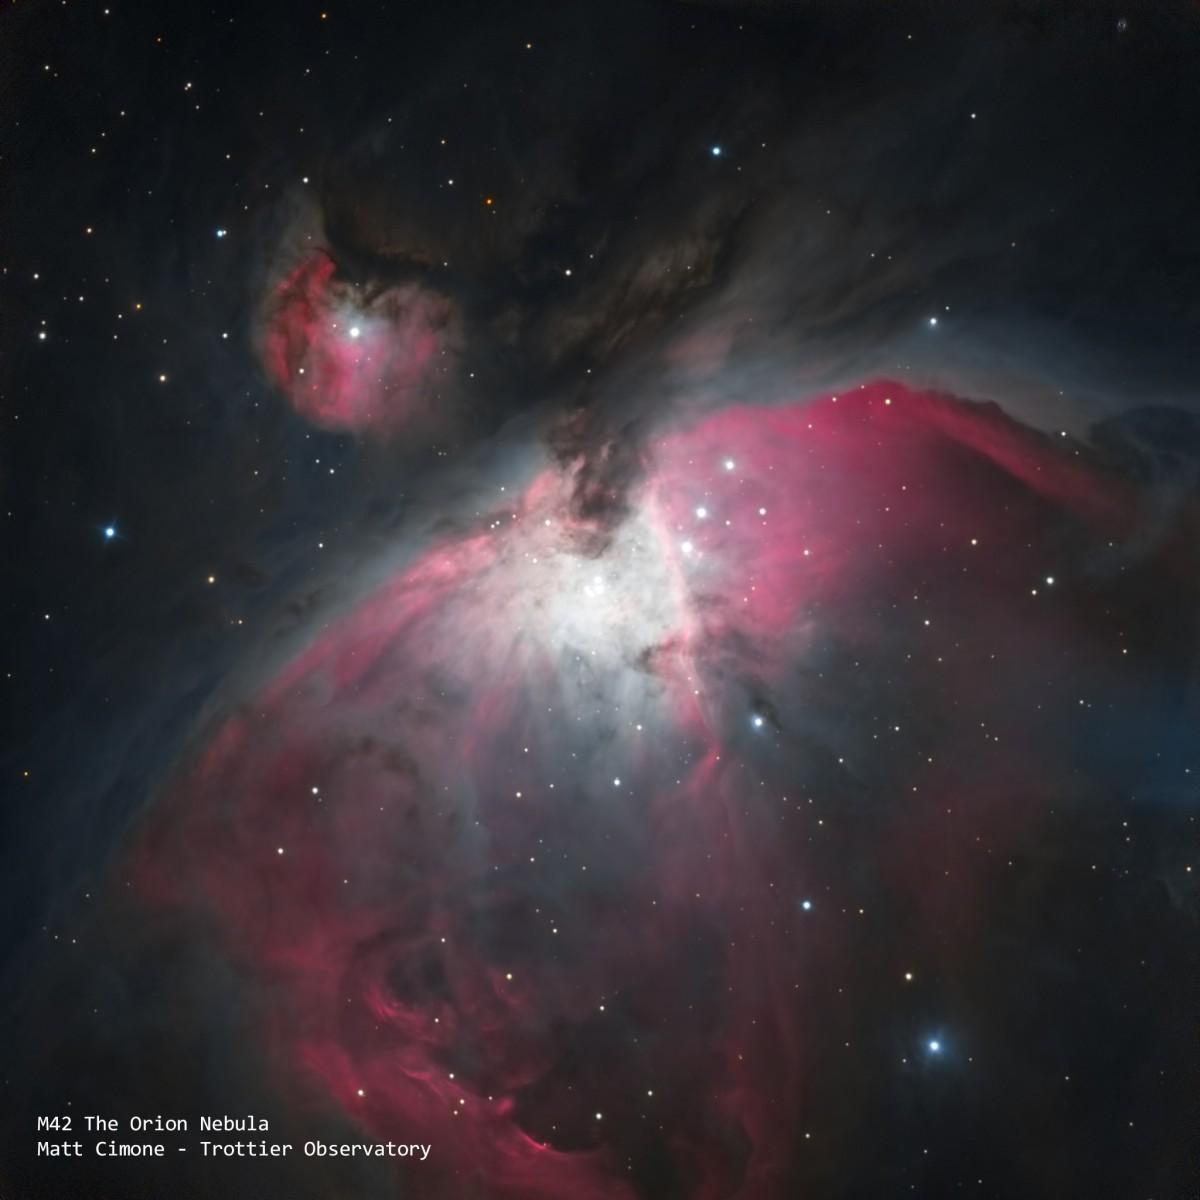 Orion NebulaI Some adjustments - Title